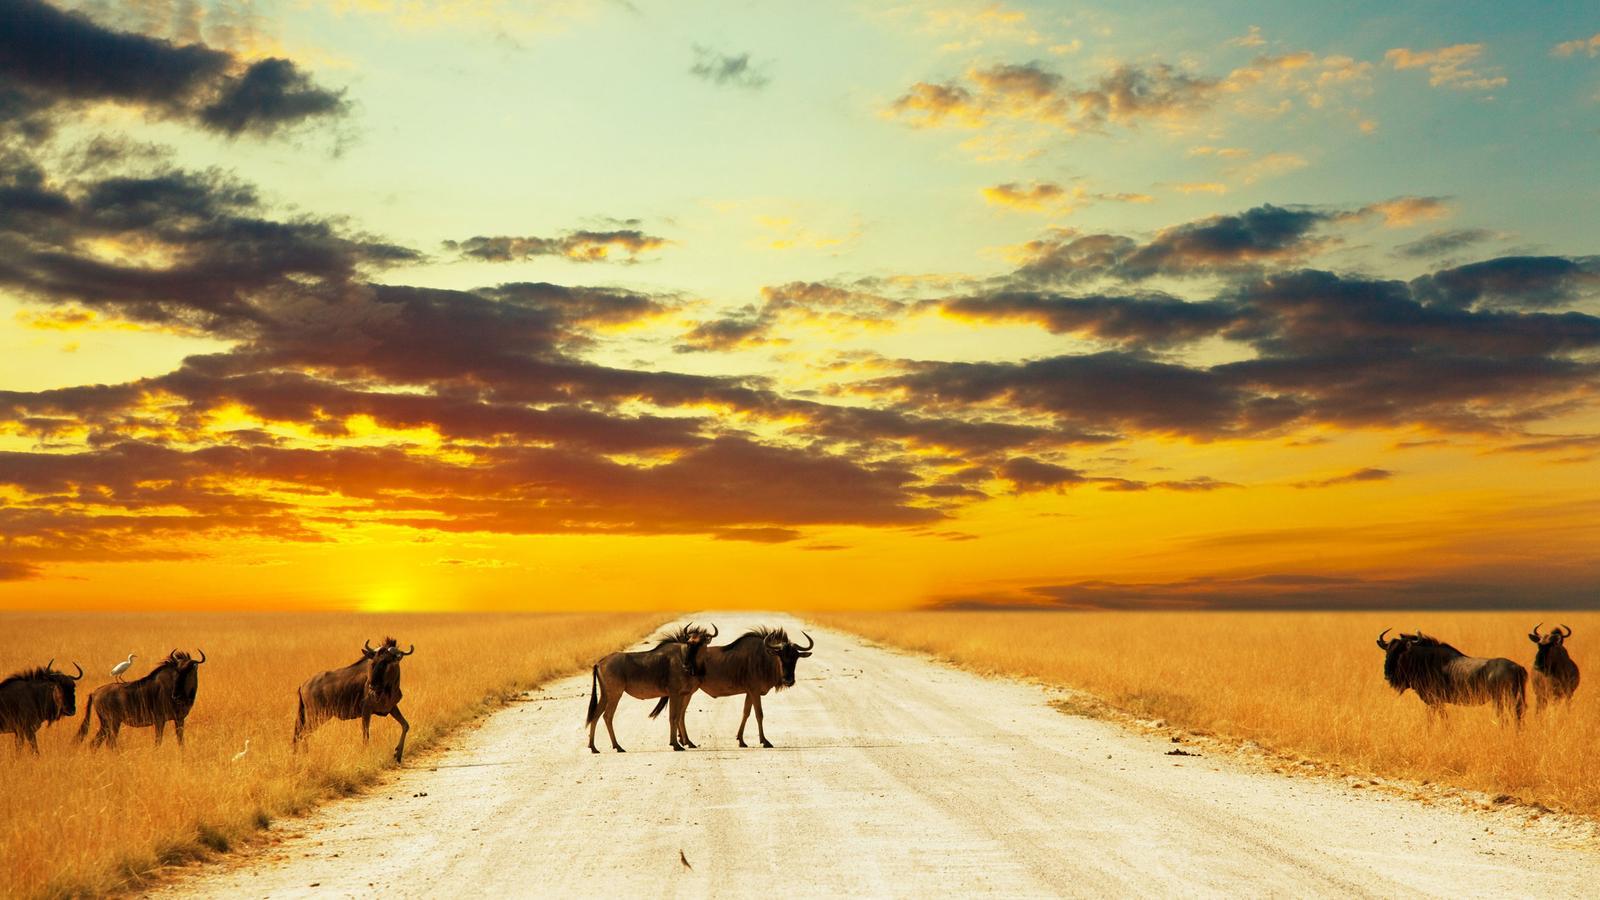 Gnus in Serengeti Tansania Afrika Reisen für junge Leute traveljunkies Safari